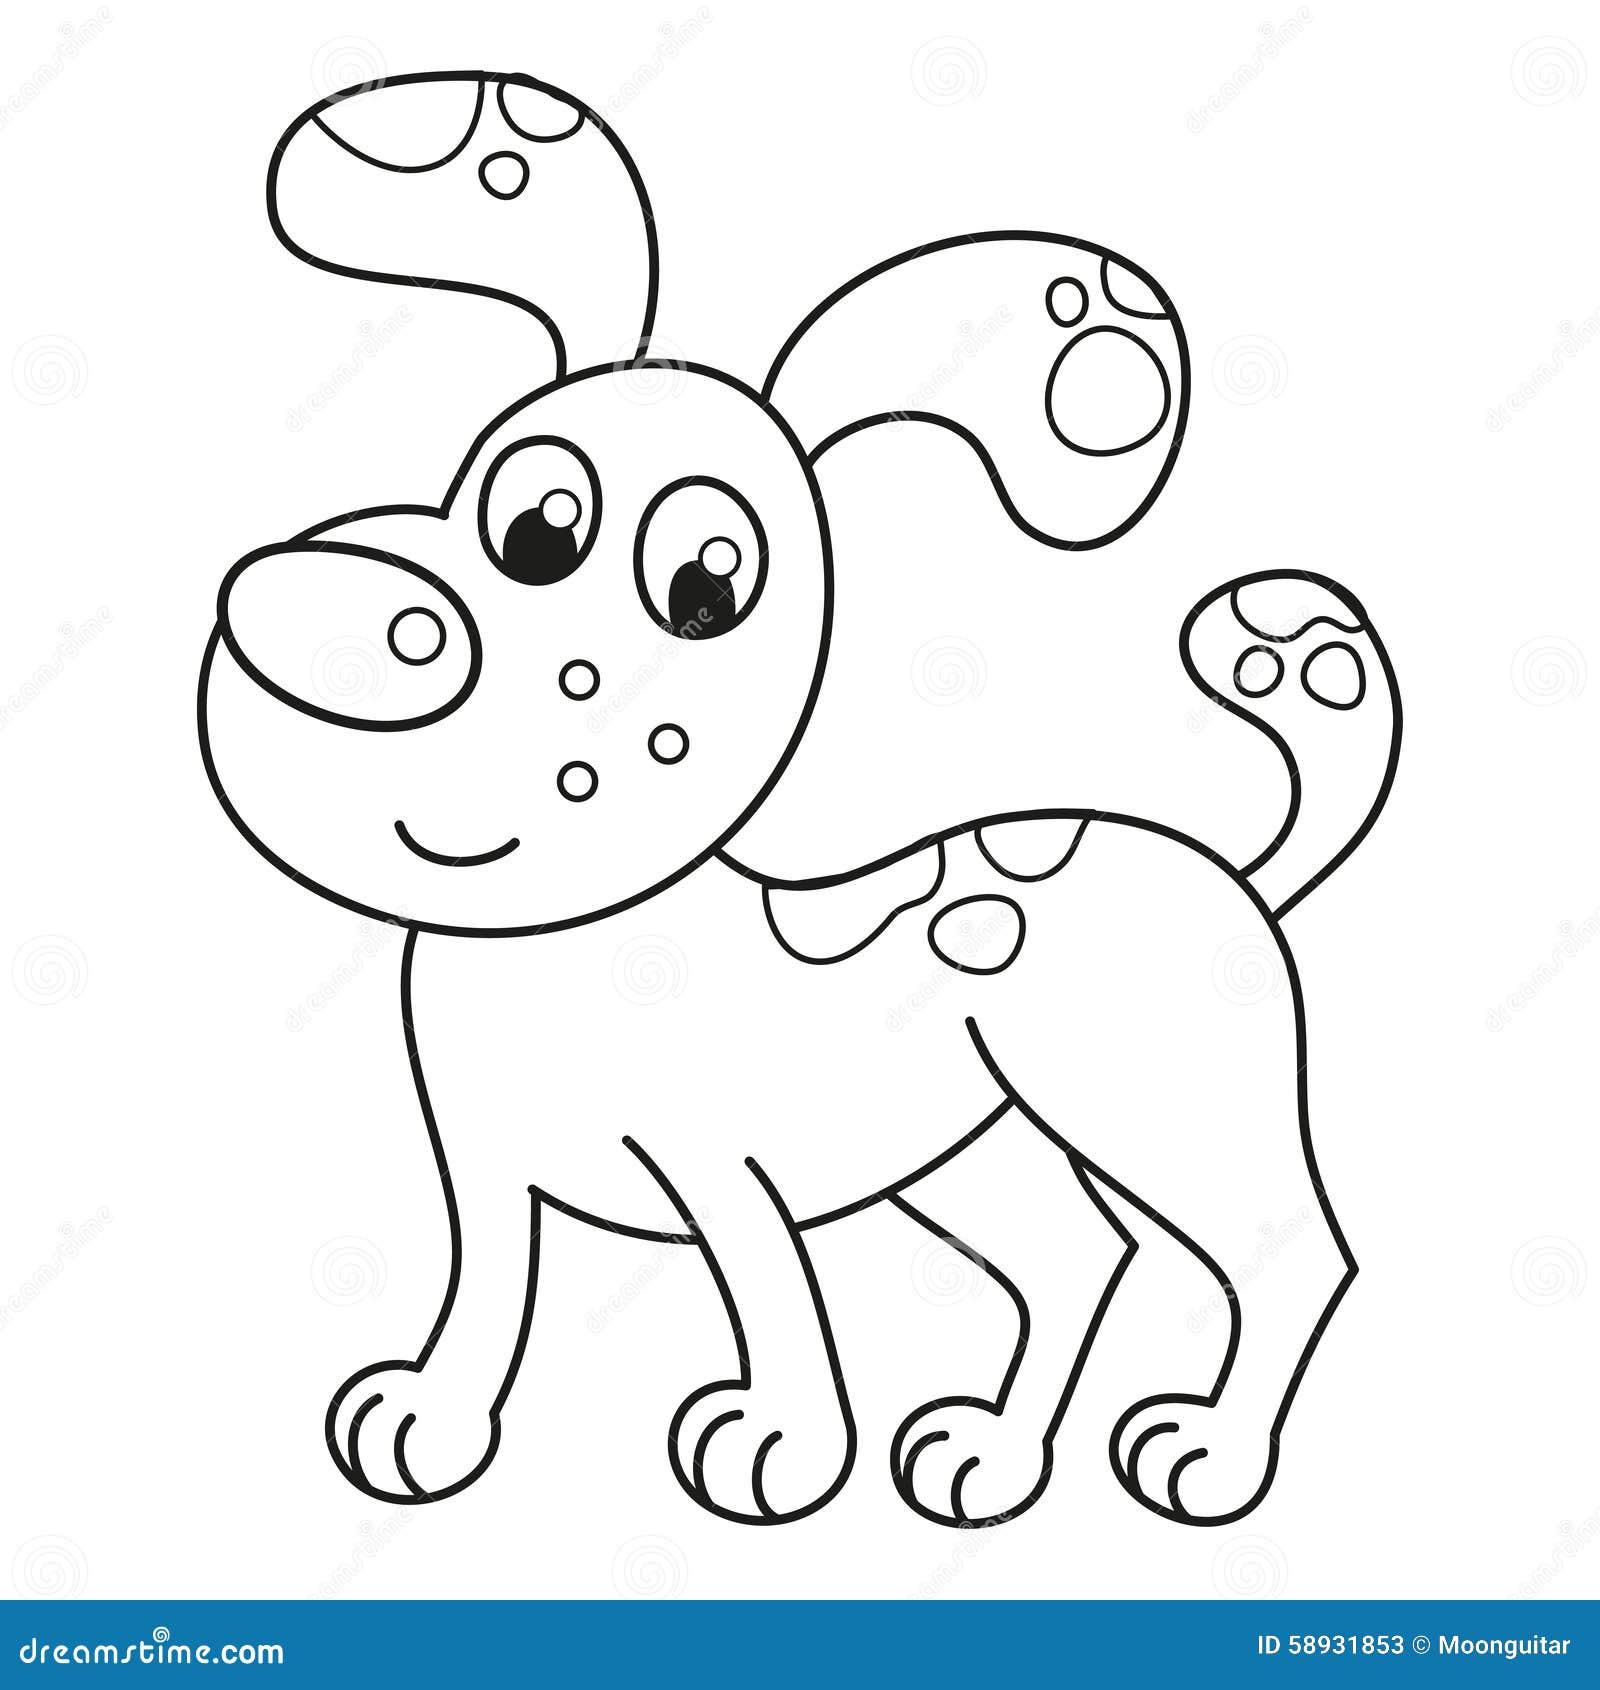 Cartoon Smiling Spotty Puppy Naughty Dog Stock Vector